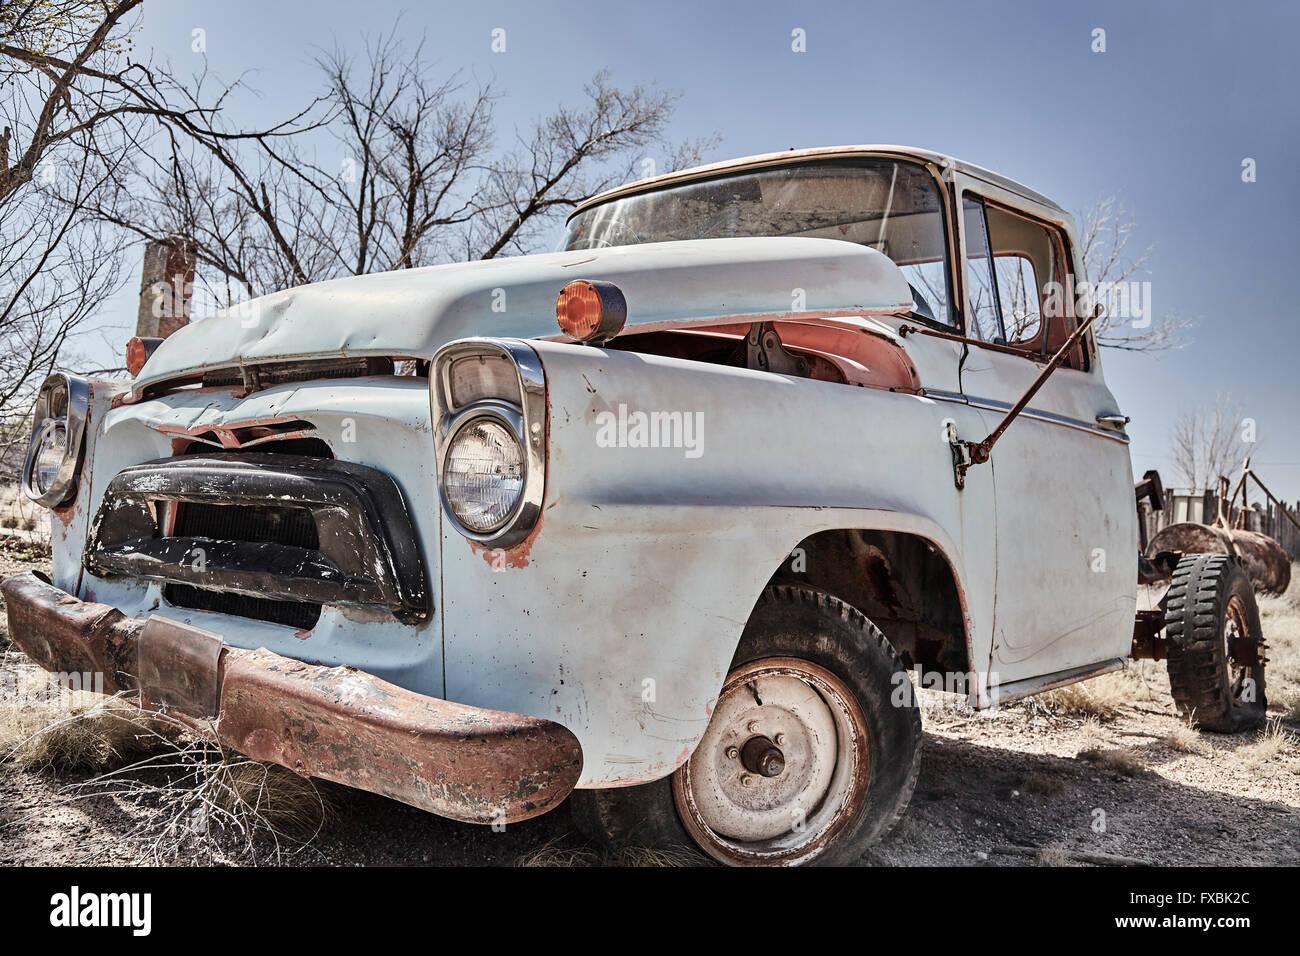 Vintage pickup truck abandoned classic junkyard wreck old ...